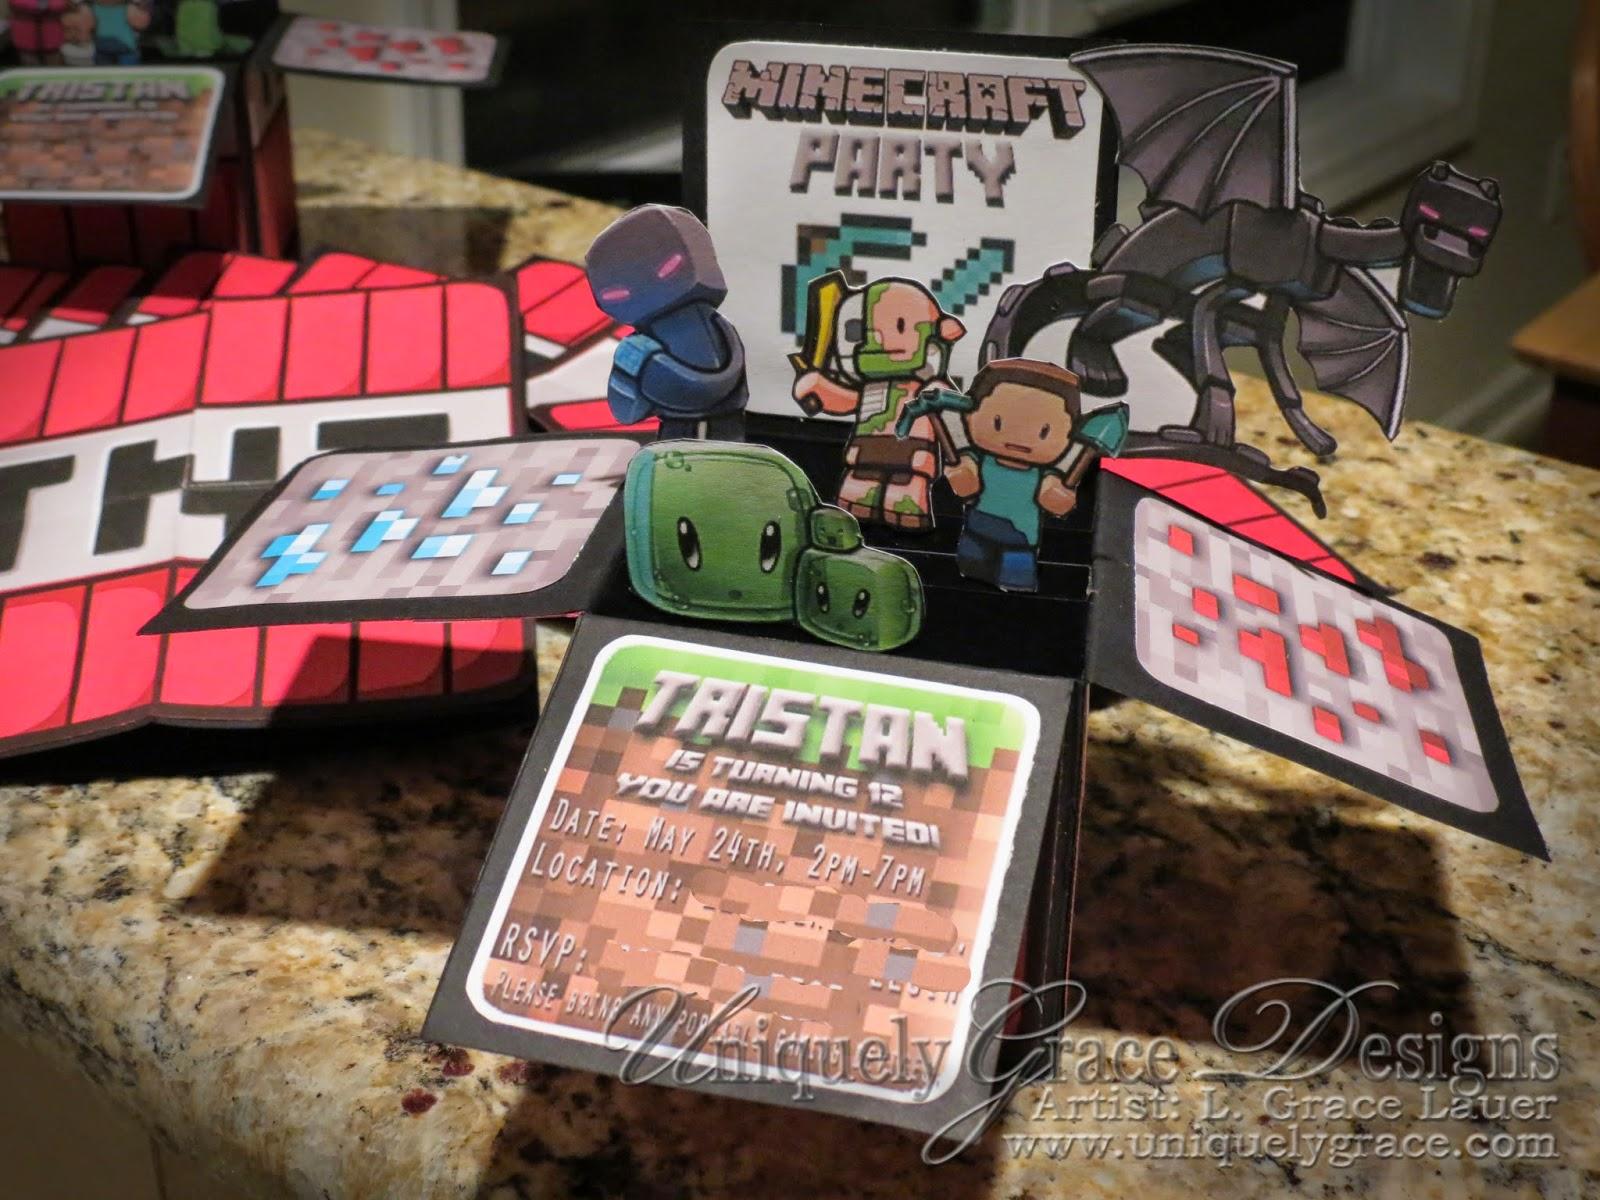 Uniquely Grace Minecraft 3D Box Birthday Party Invitations